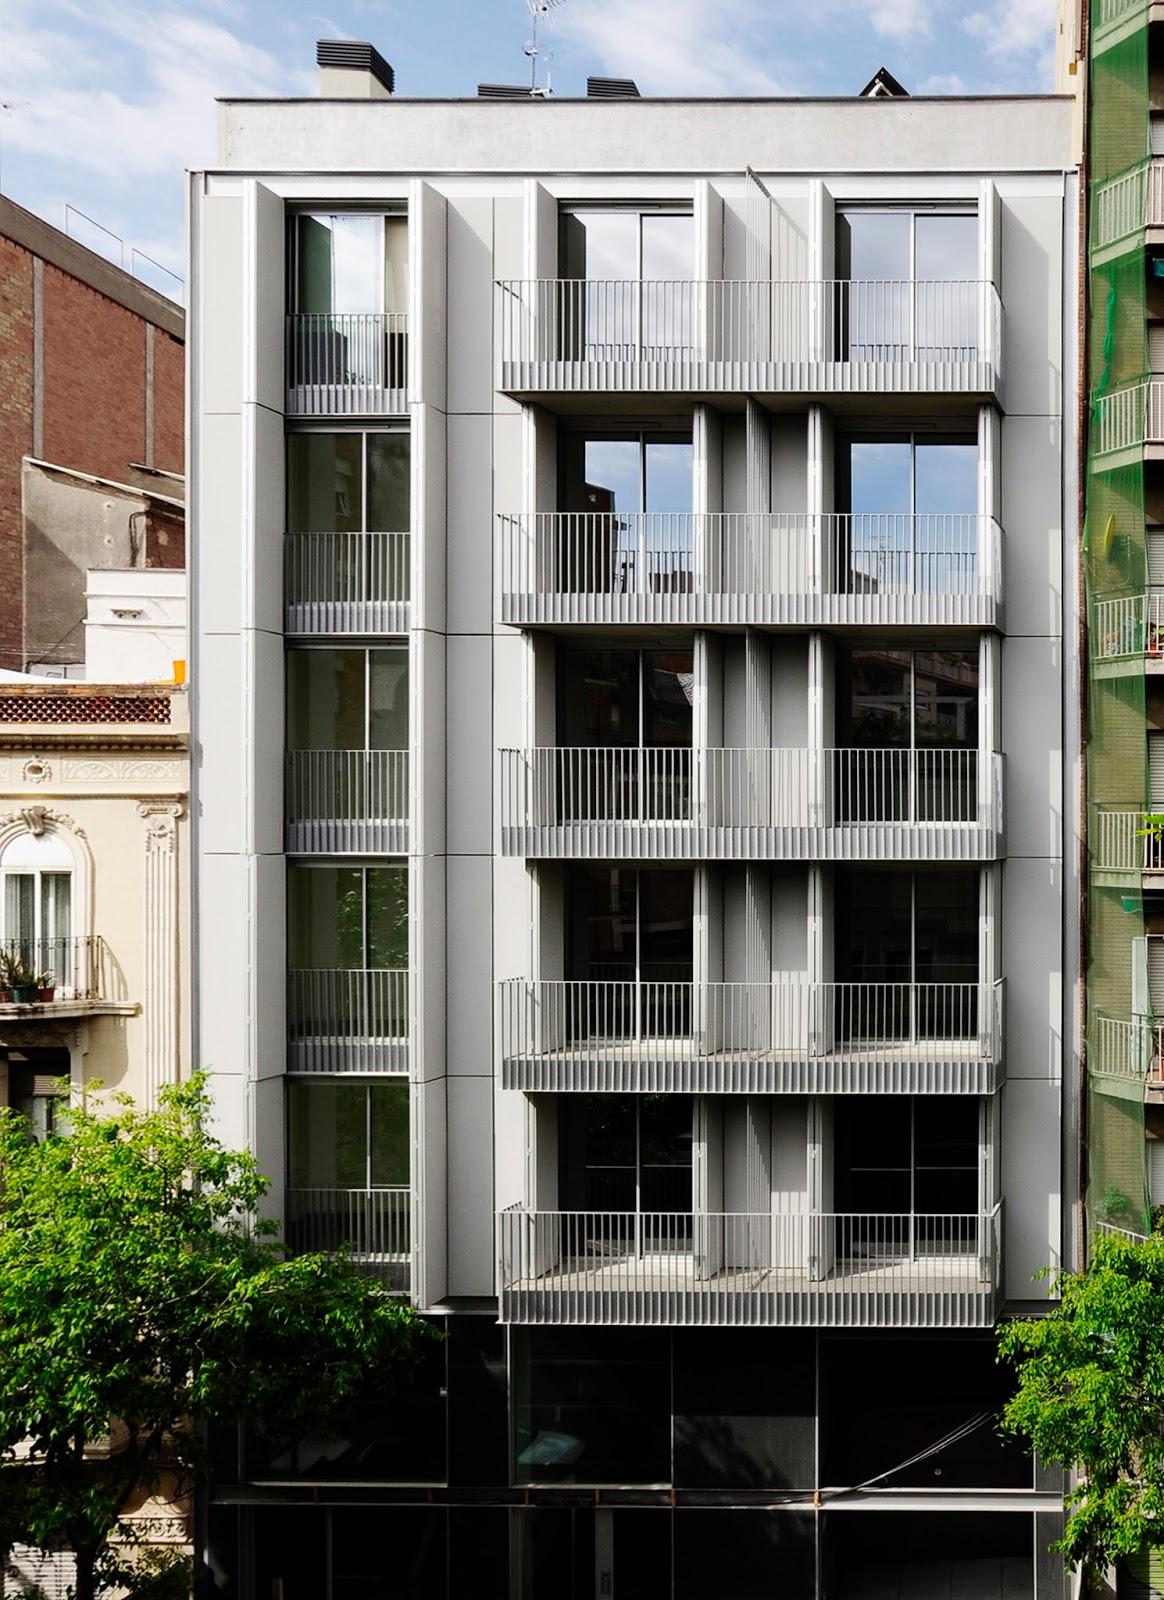 Un edificio con fachada textil ava studio arquitectura - Fachadas arquitectura ...